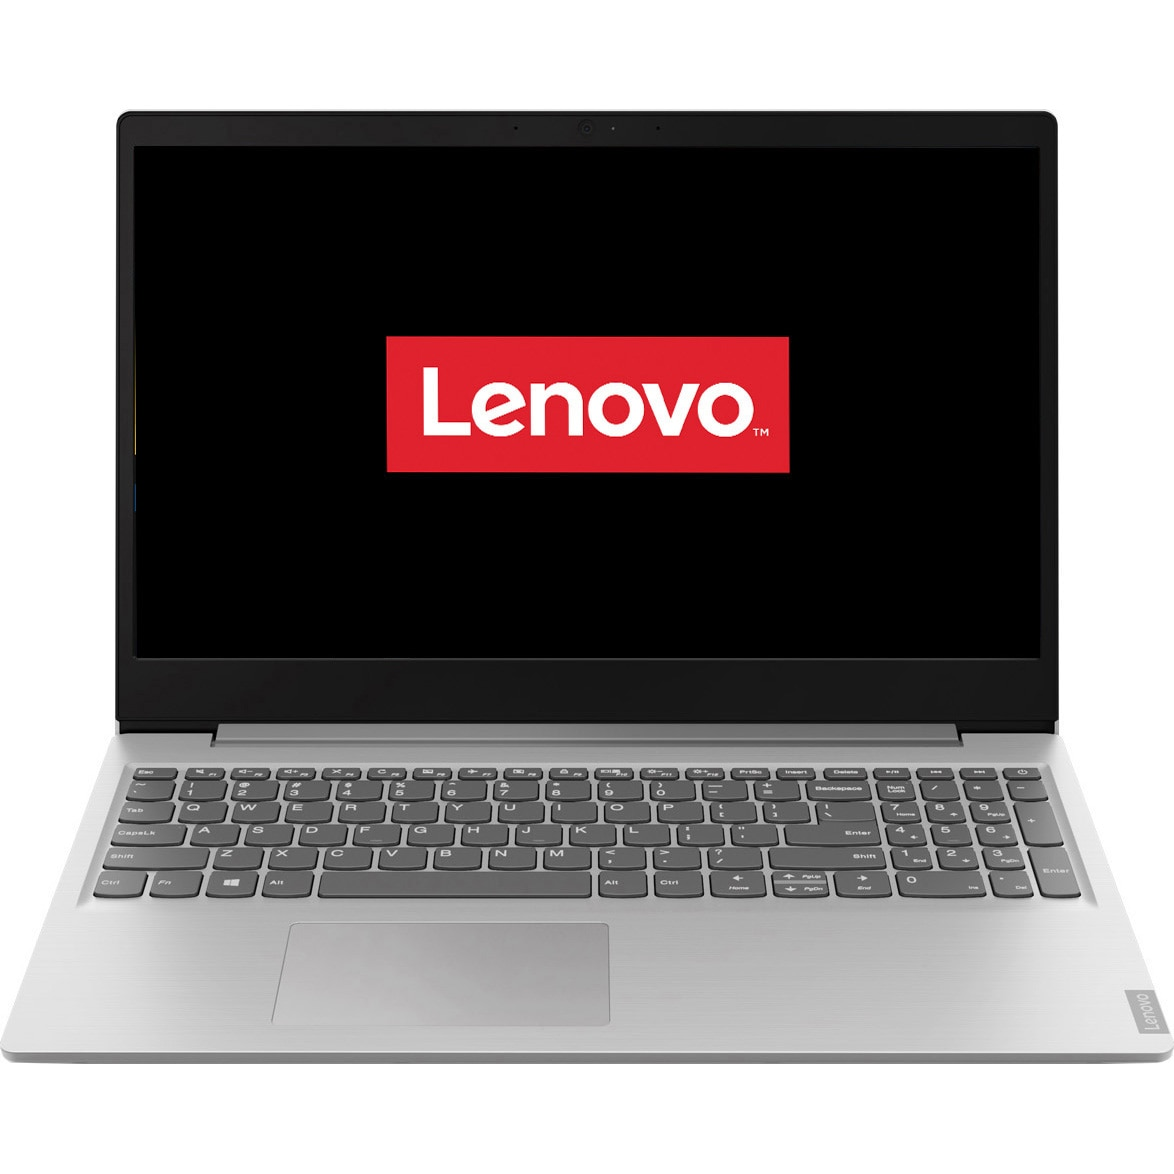 "Fotografie Laptop Lenovo ideapad S145-15AST cu procesor AMD A4-9125, 15.6"" HD, 4GB, 128GB SSD, AMD Radeon™ R3 Graphics, FreeDOS, Platinum Grey"